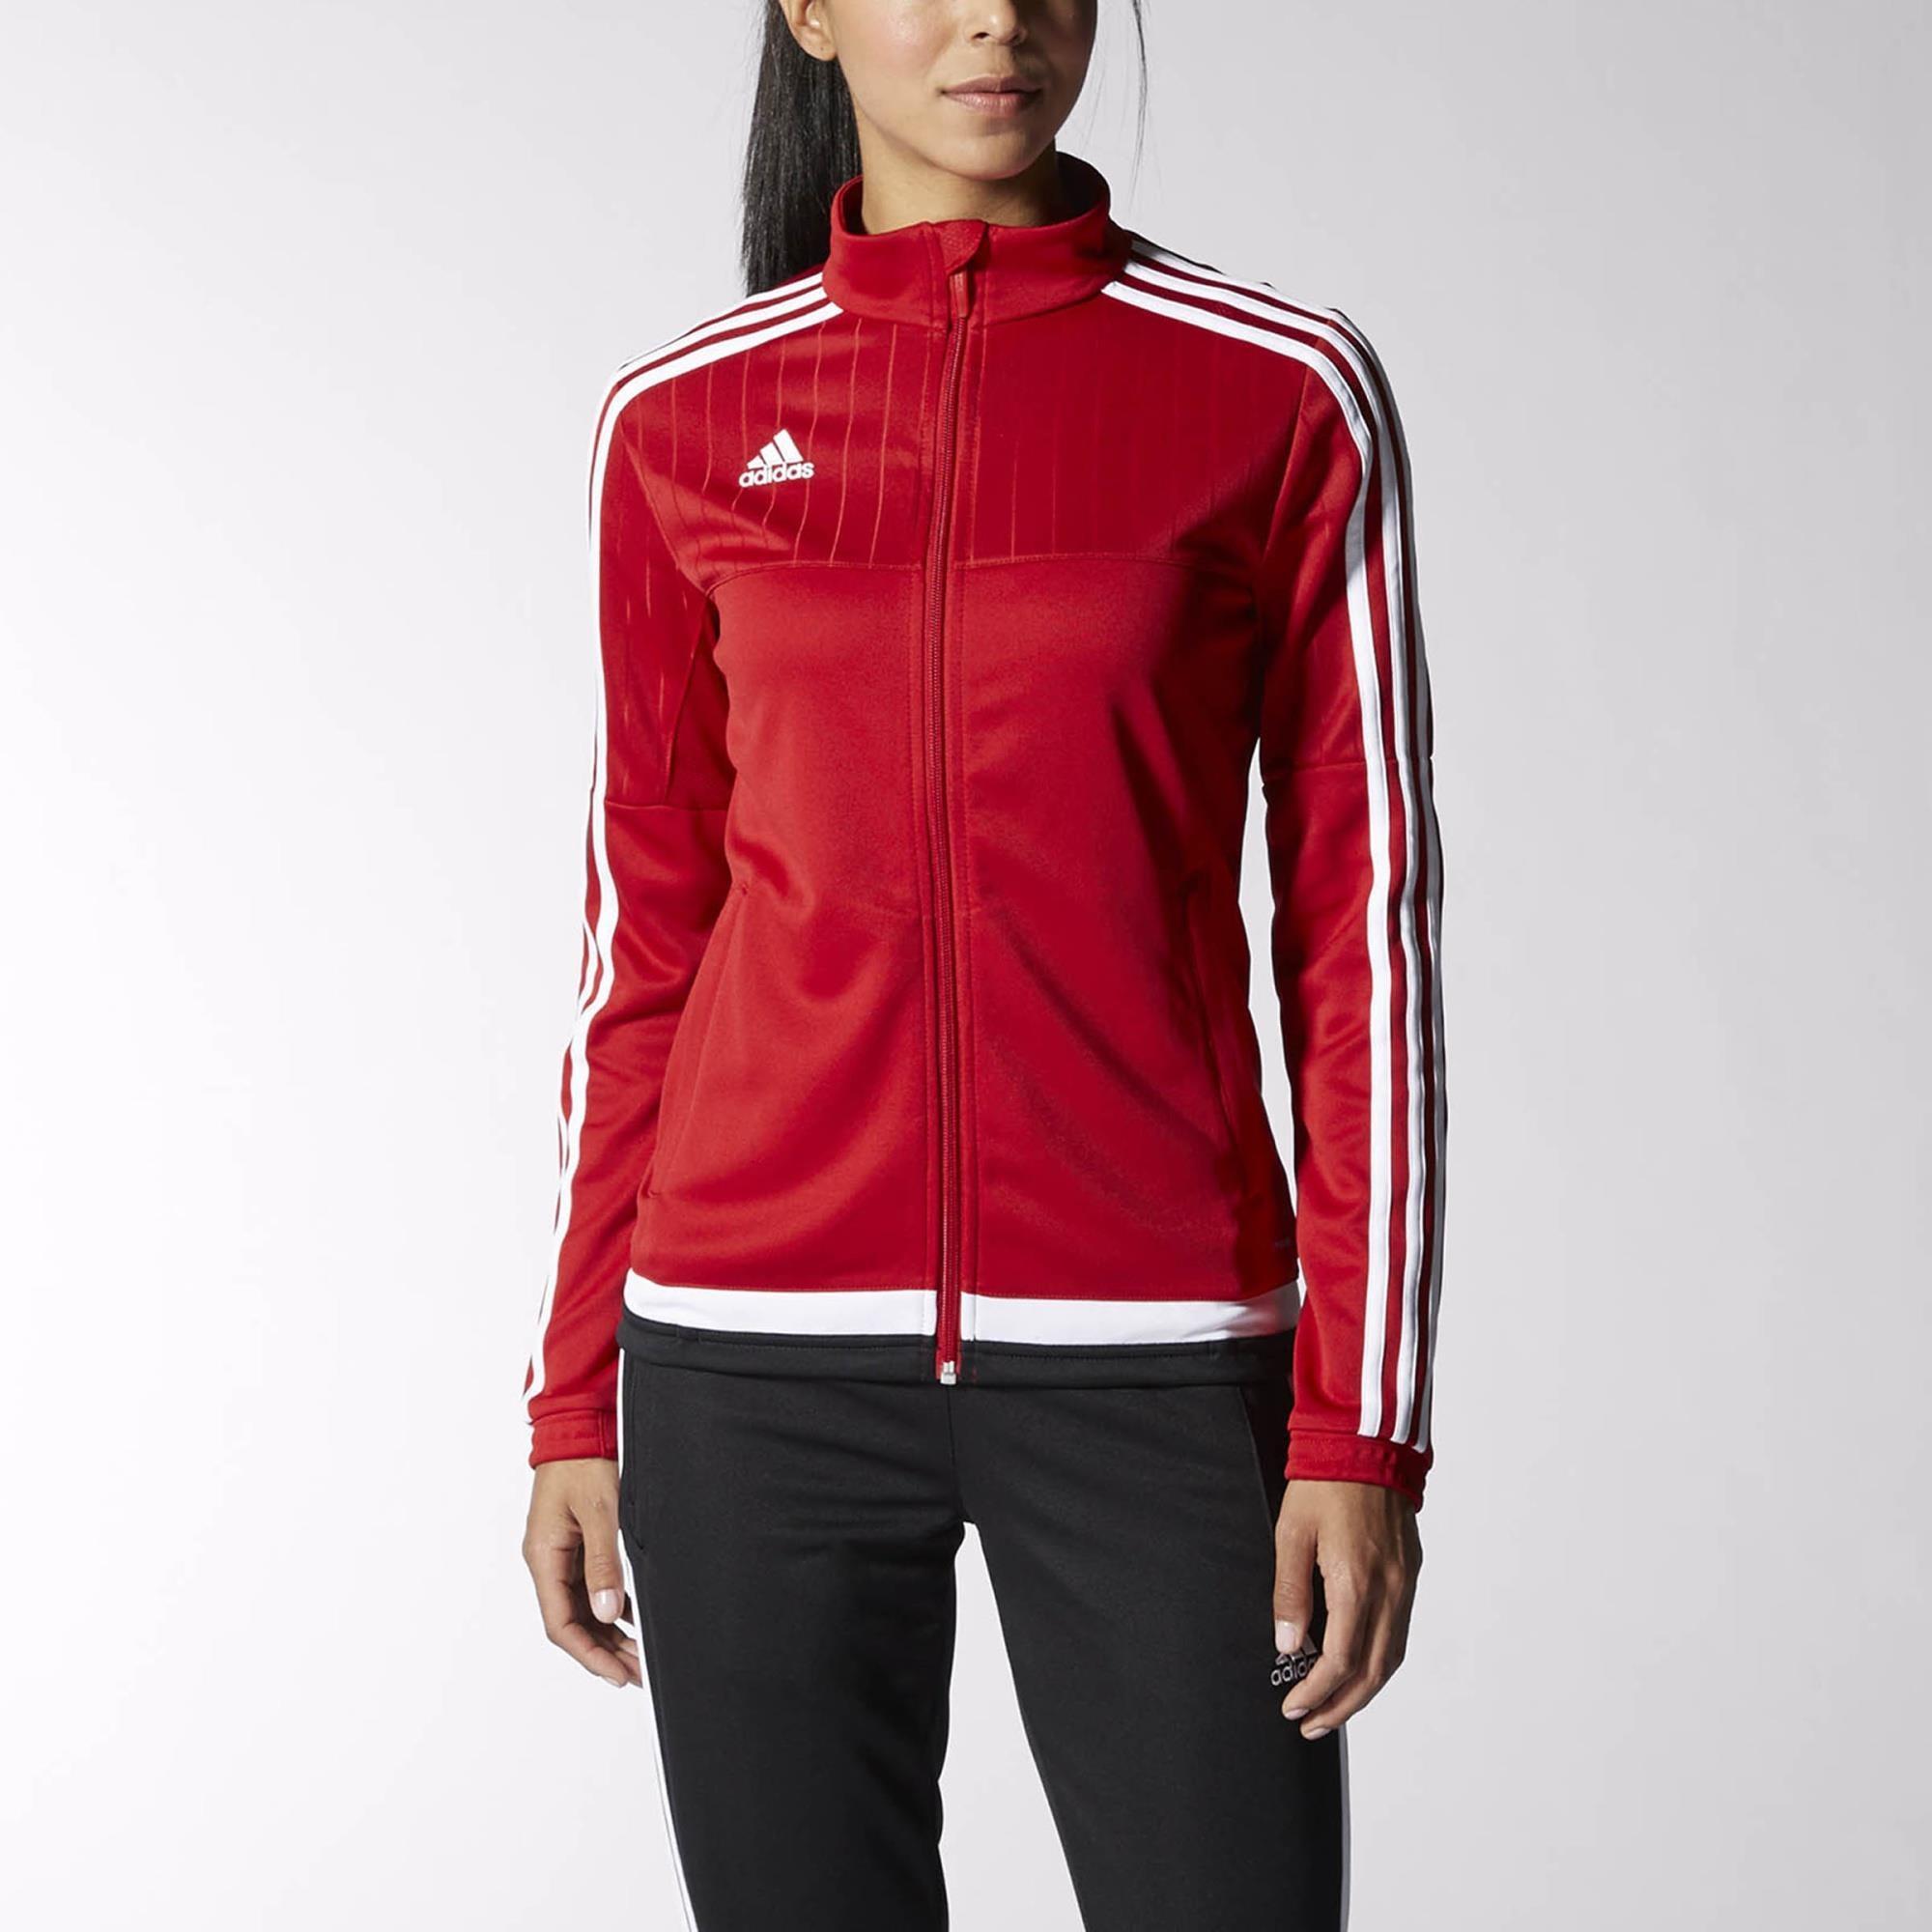 Adidas Men's Tiro 15 Training Jacket